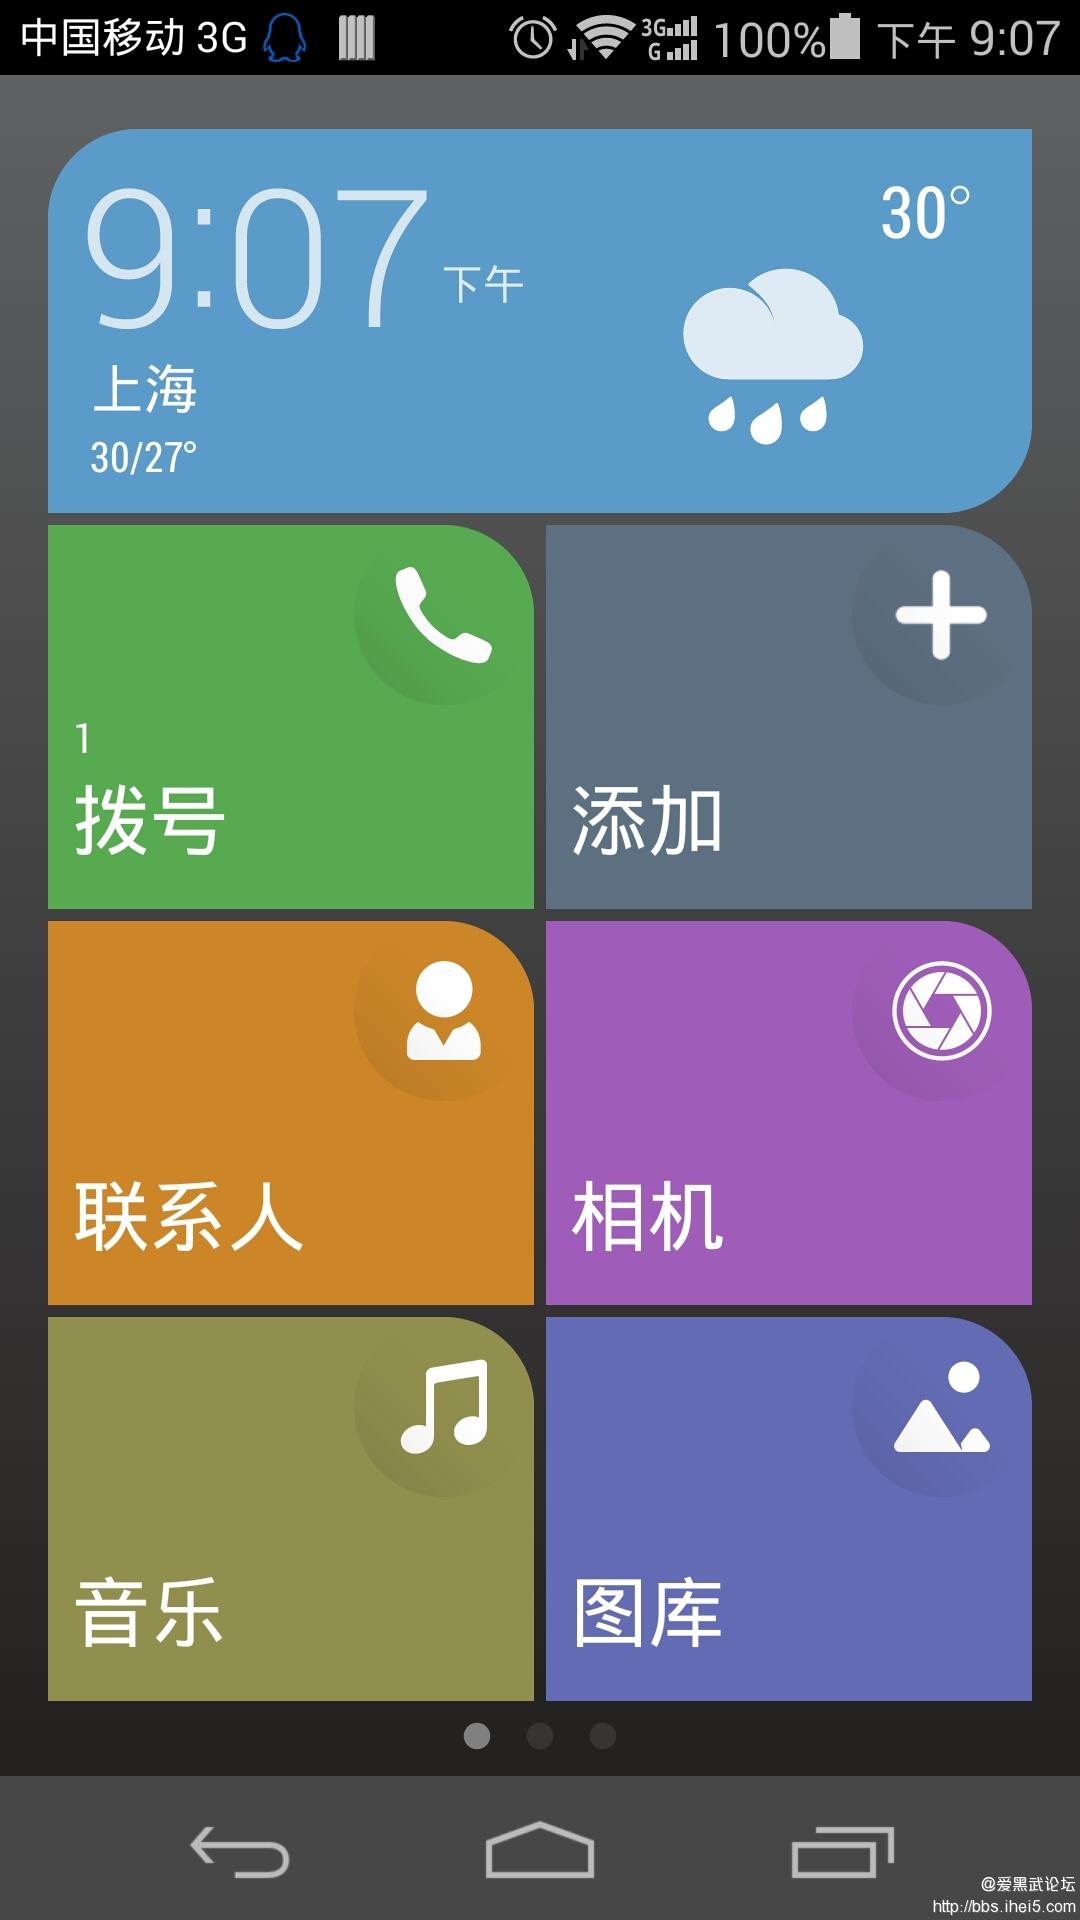 Screenshot_2014-07-25-21-07-55.jpeg